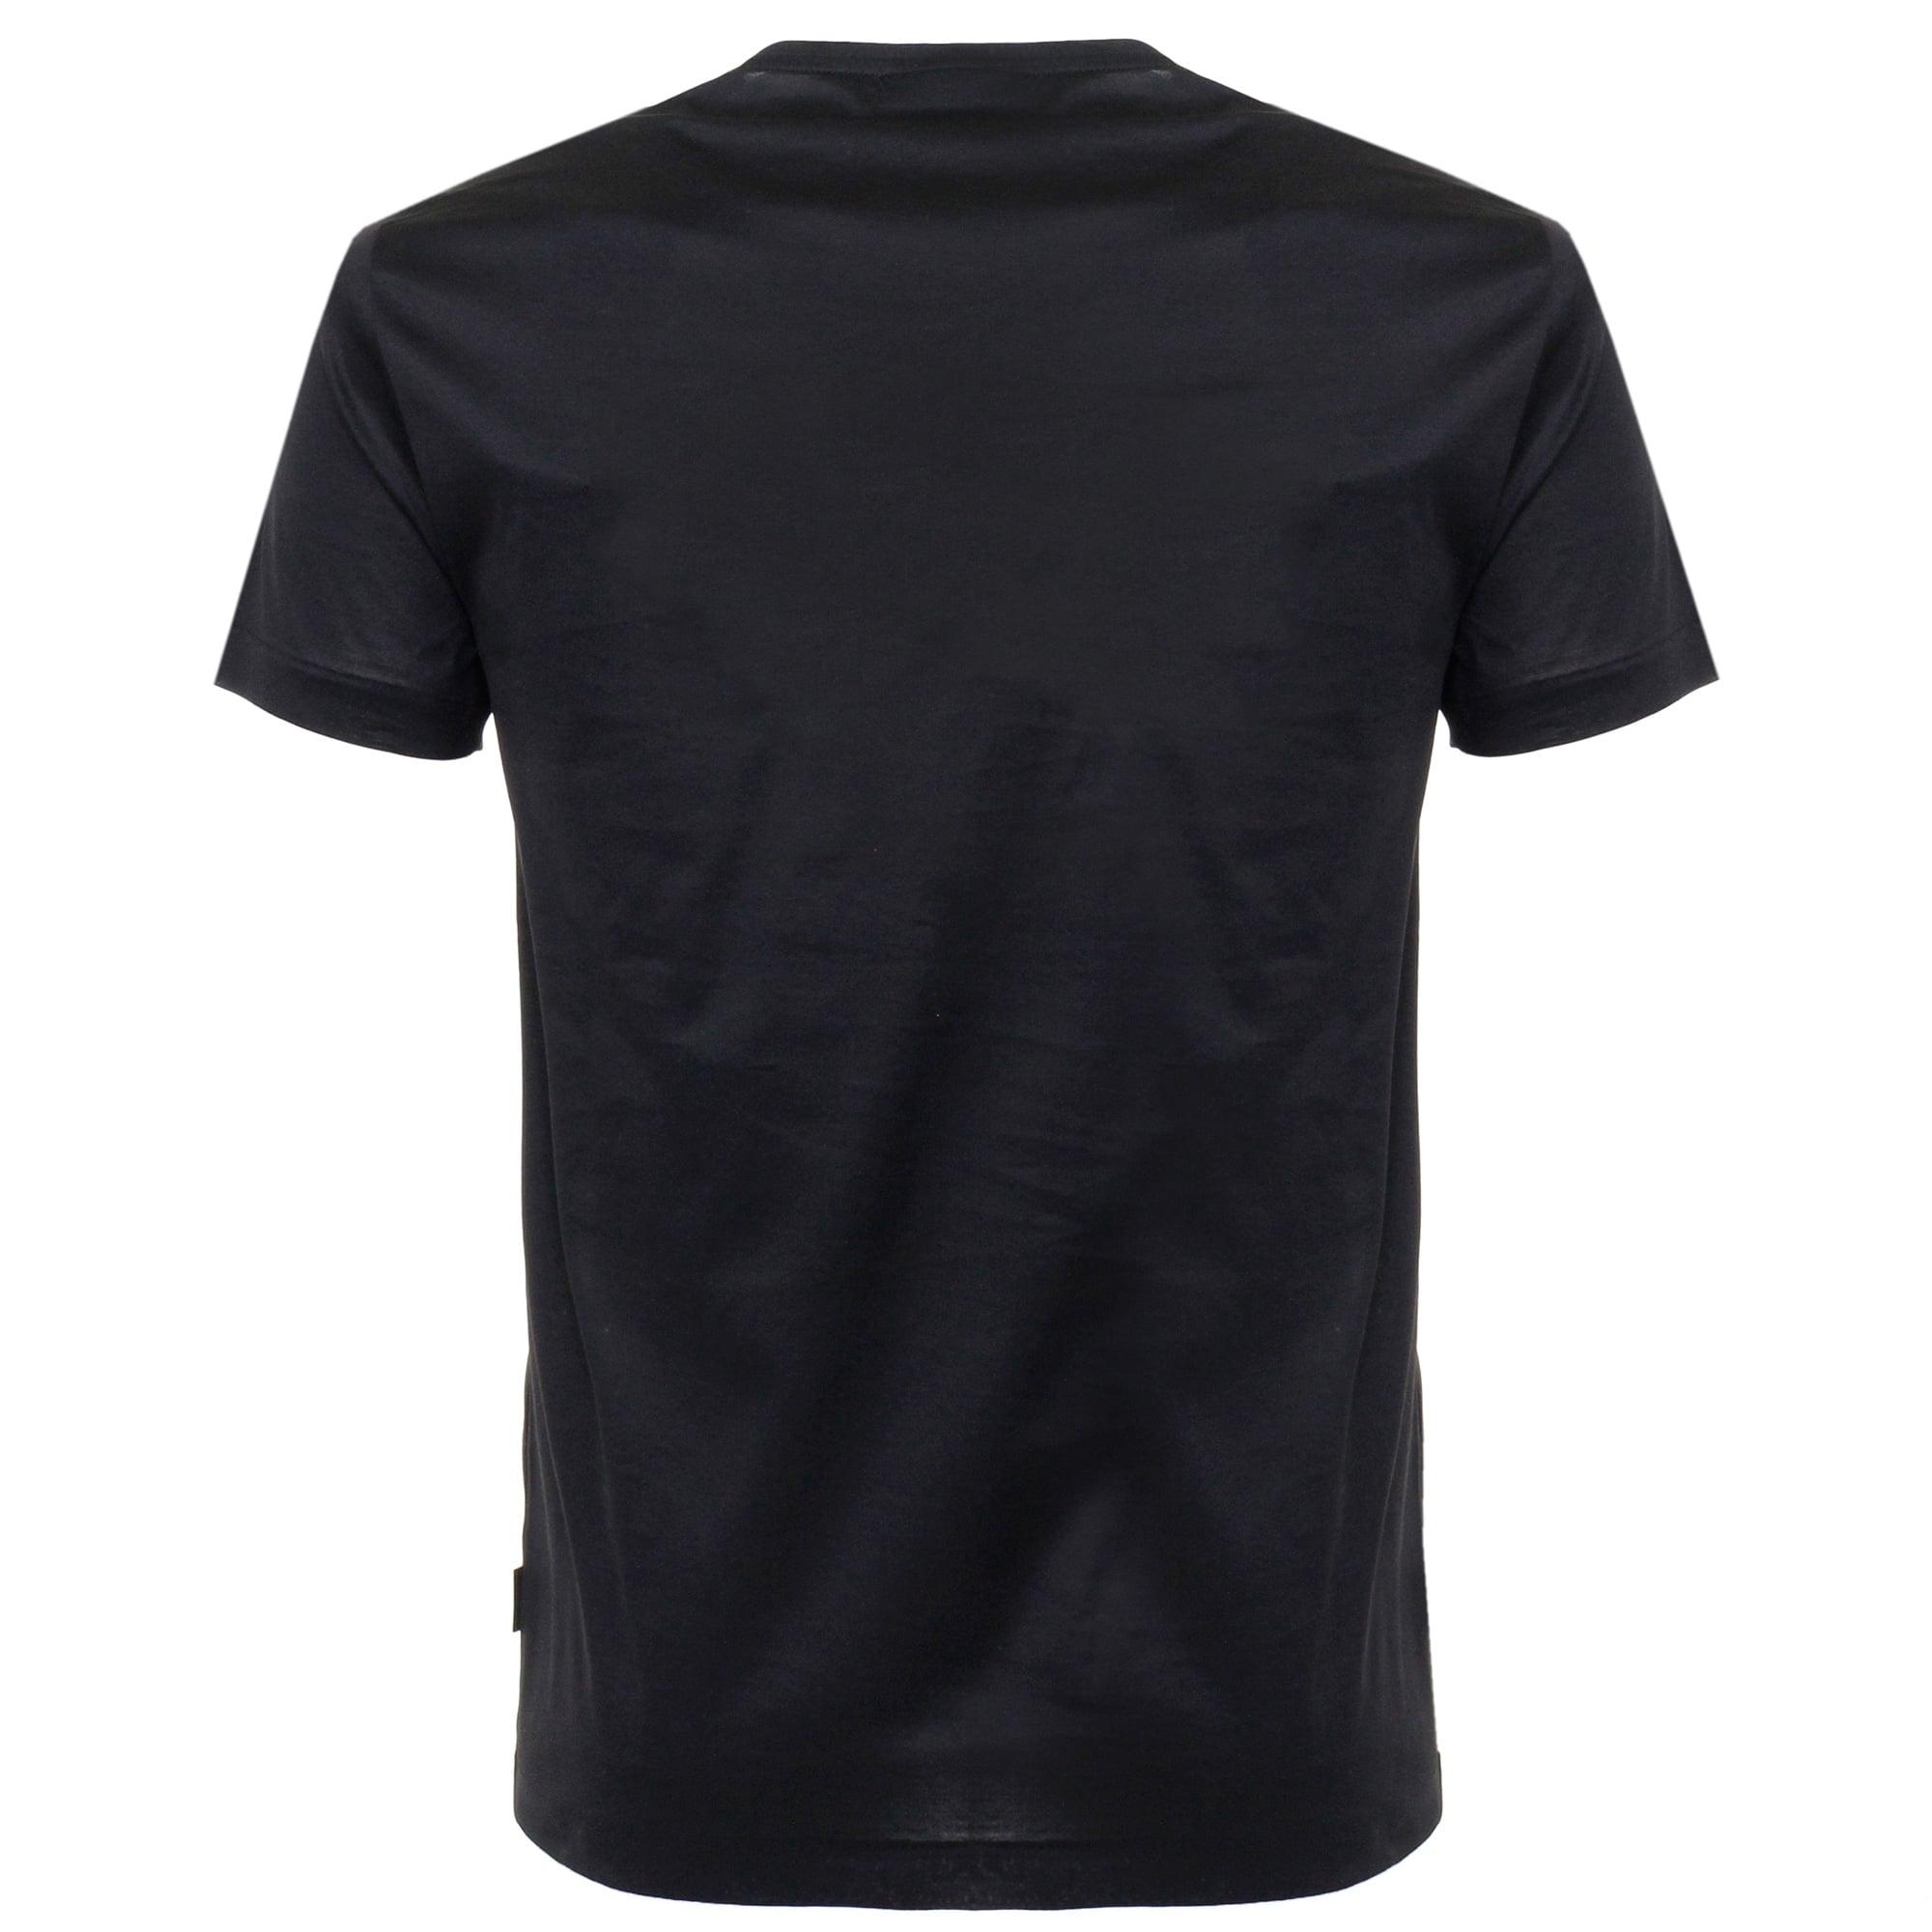 Black t shirt calvin klein - Black T Shirt Calvin Klein Calvin Klein Jato Merc Single Jersey Black T Shirt K10k100979